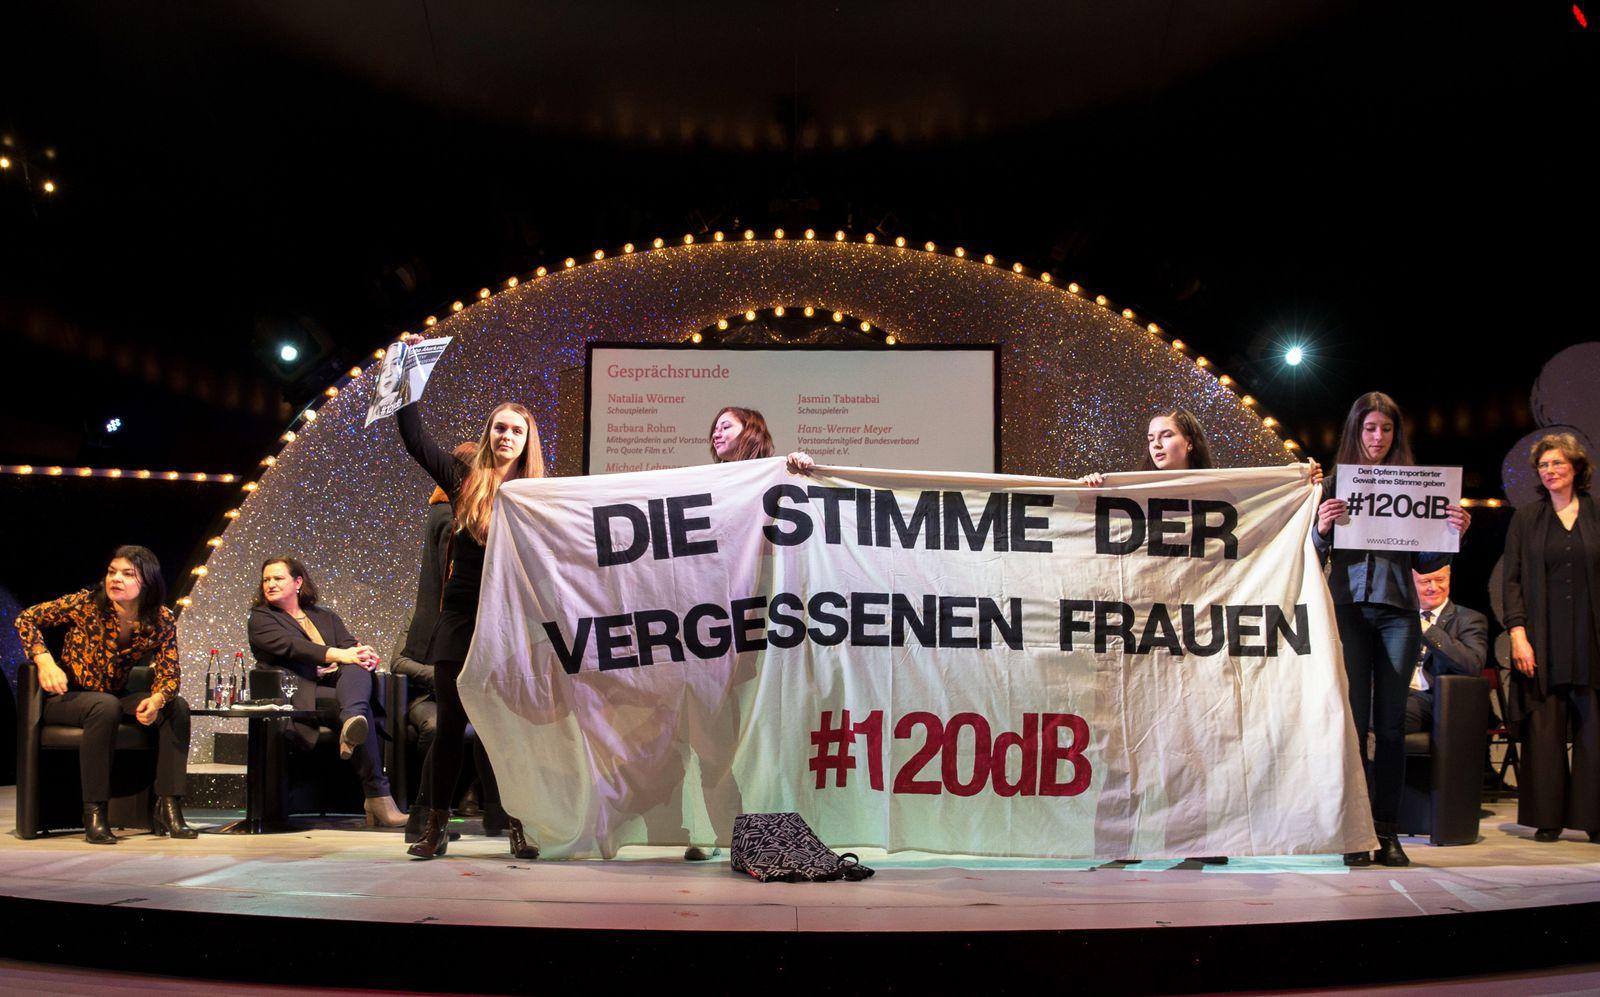 Berlinale/ Debatte/ Missbrauch